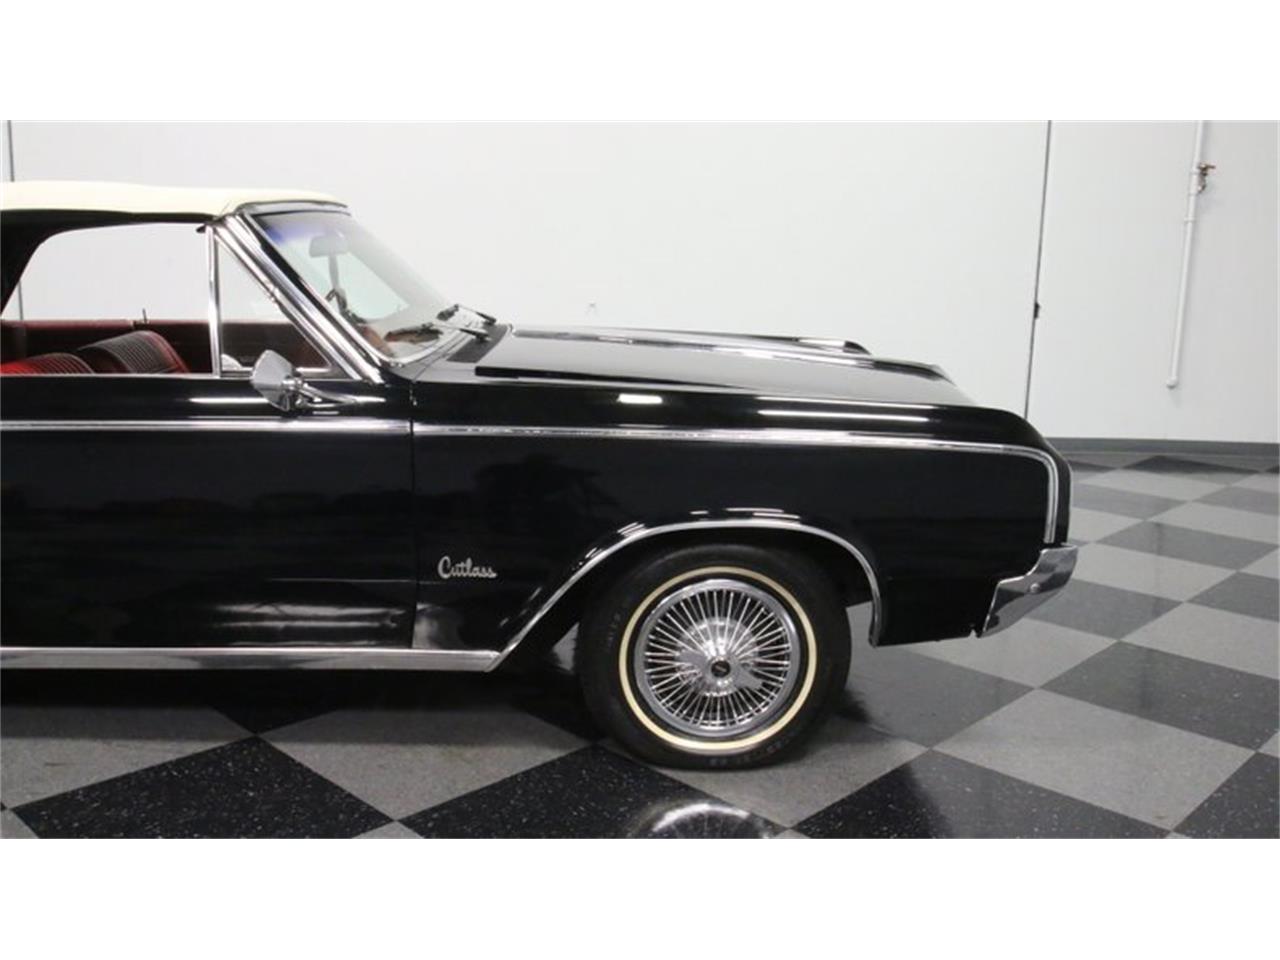 For Sale: 1964 Oldsmobile Cutlass in Lithia Springs, Georgia